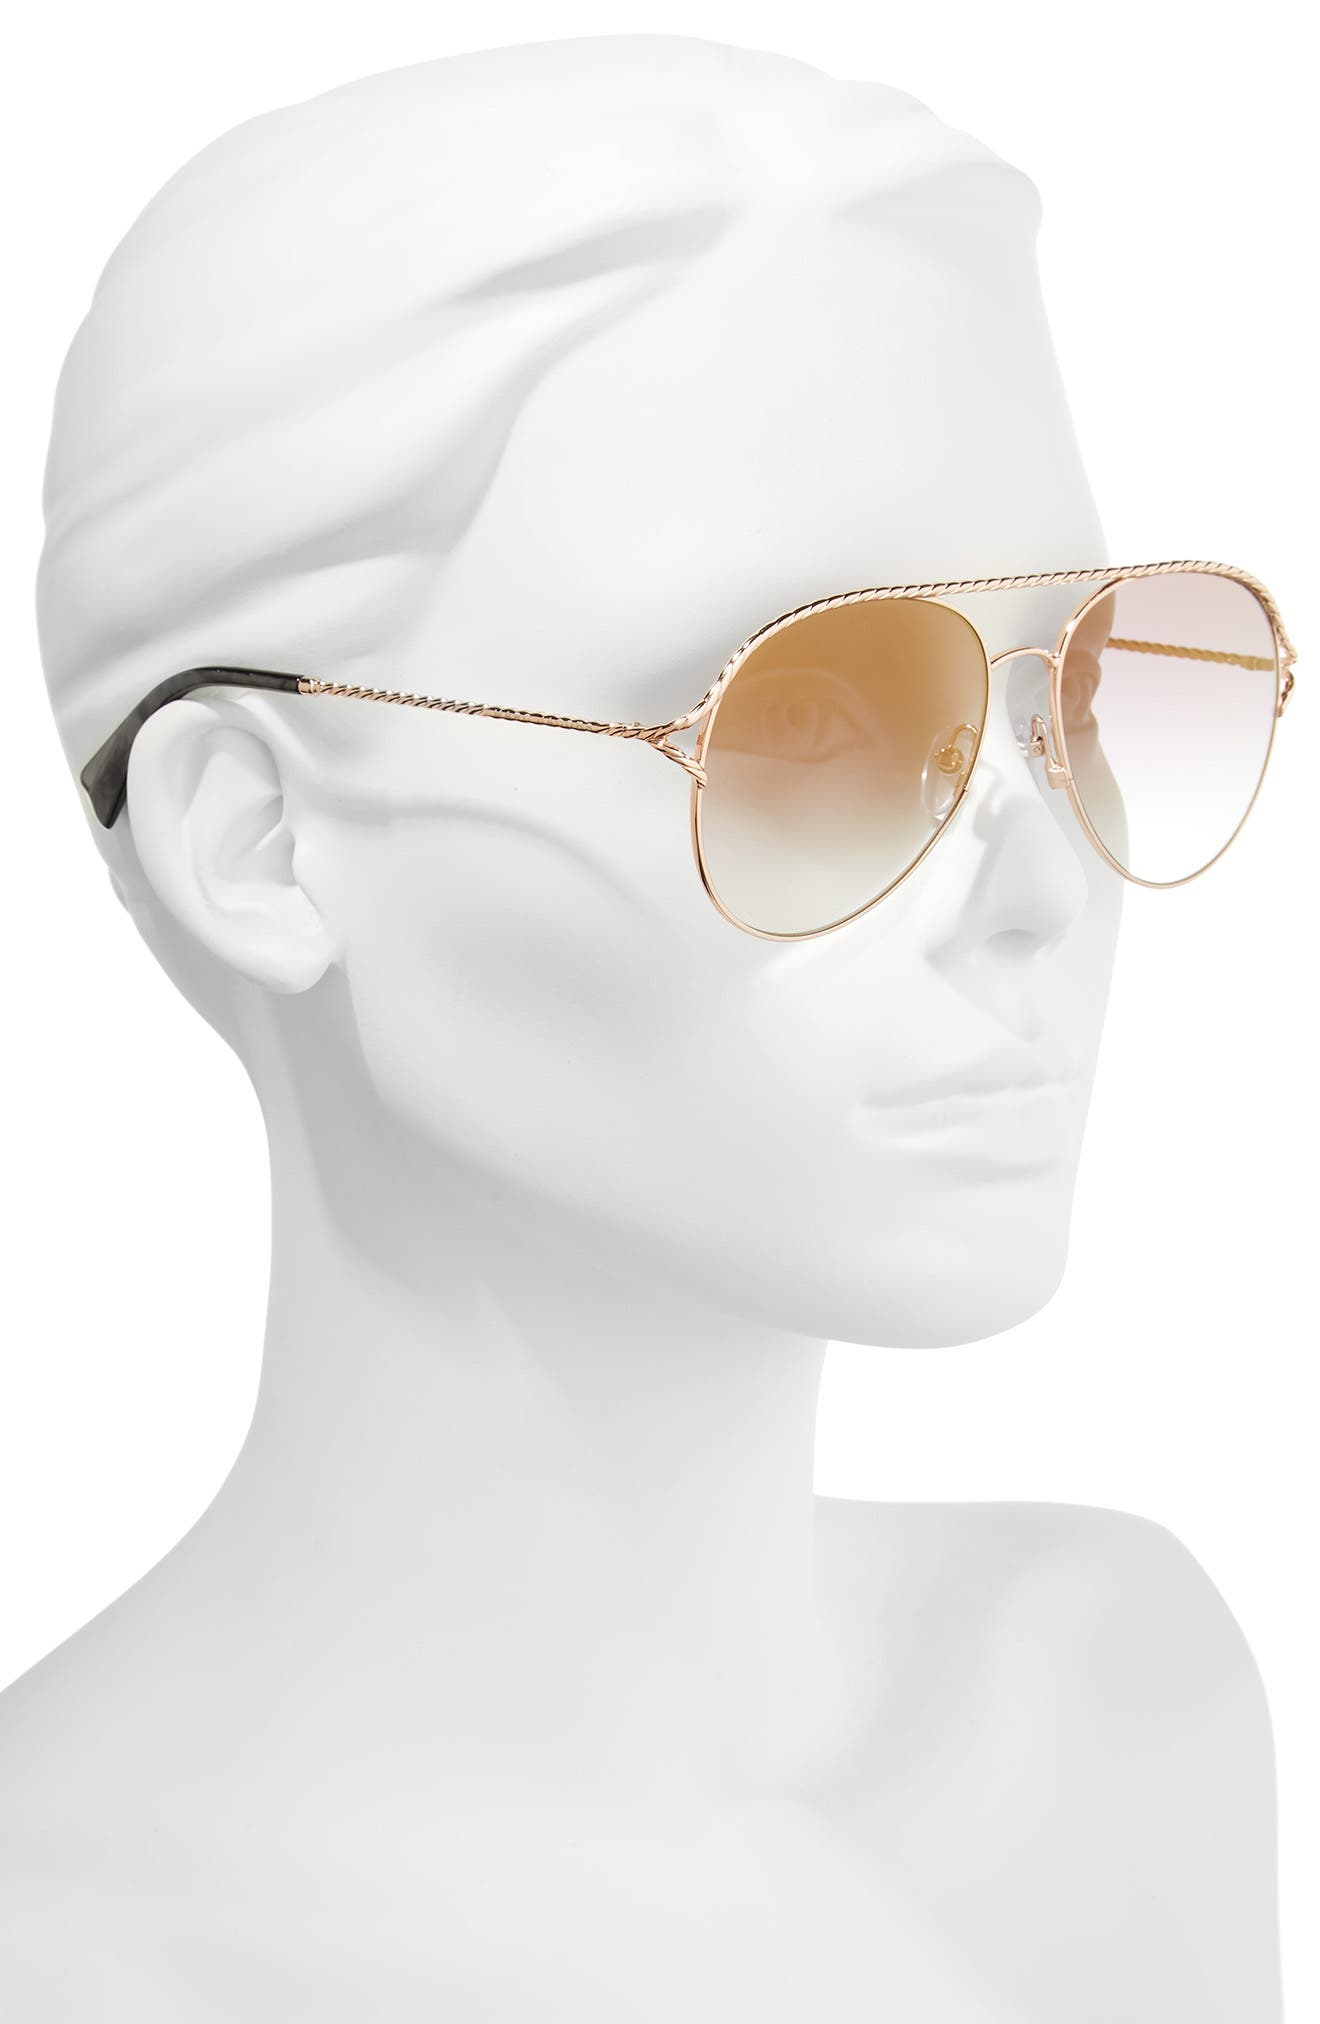 58mm Aviator Sunglasses,                             Alternate thumbnail 2, color,                             Antique Gold Green